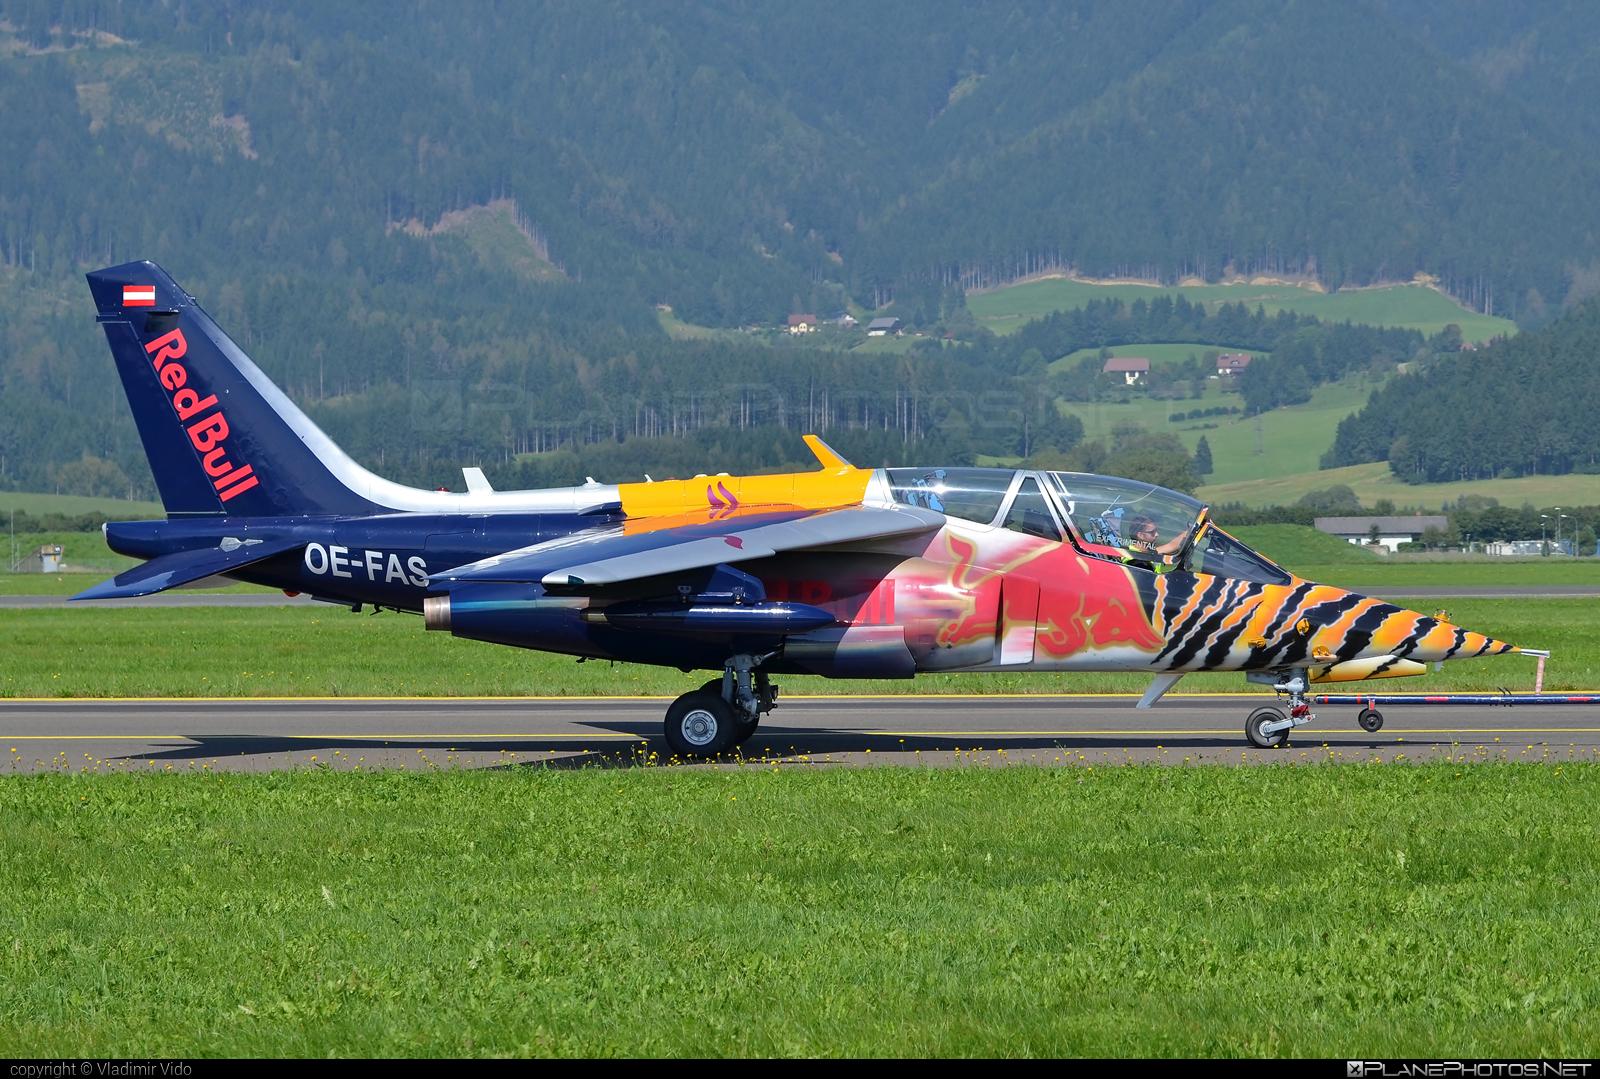 Dassault-Dornier Alpha Jet FB - OE-FAS operated by The Flying Bulls #alphajet #alphajetfb #dassaultdornier #theflyingbulls